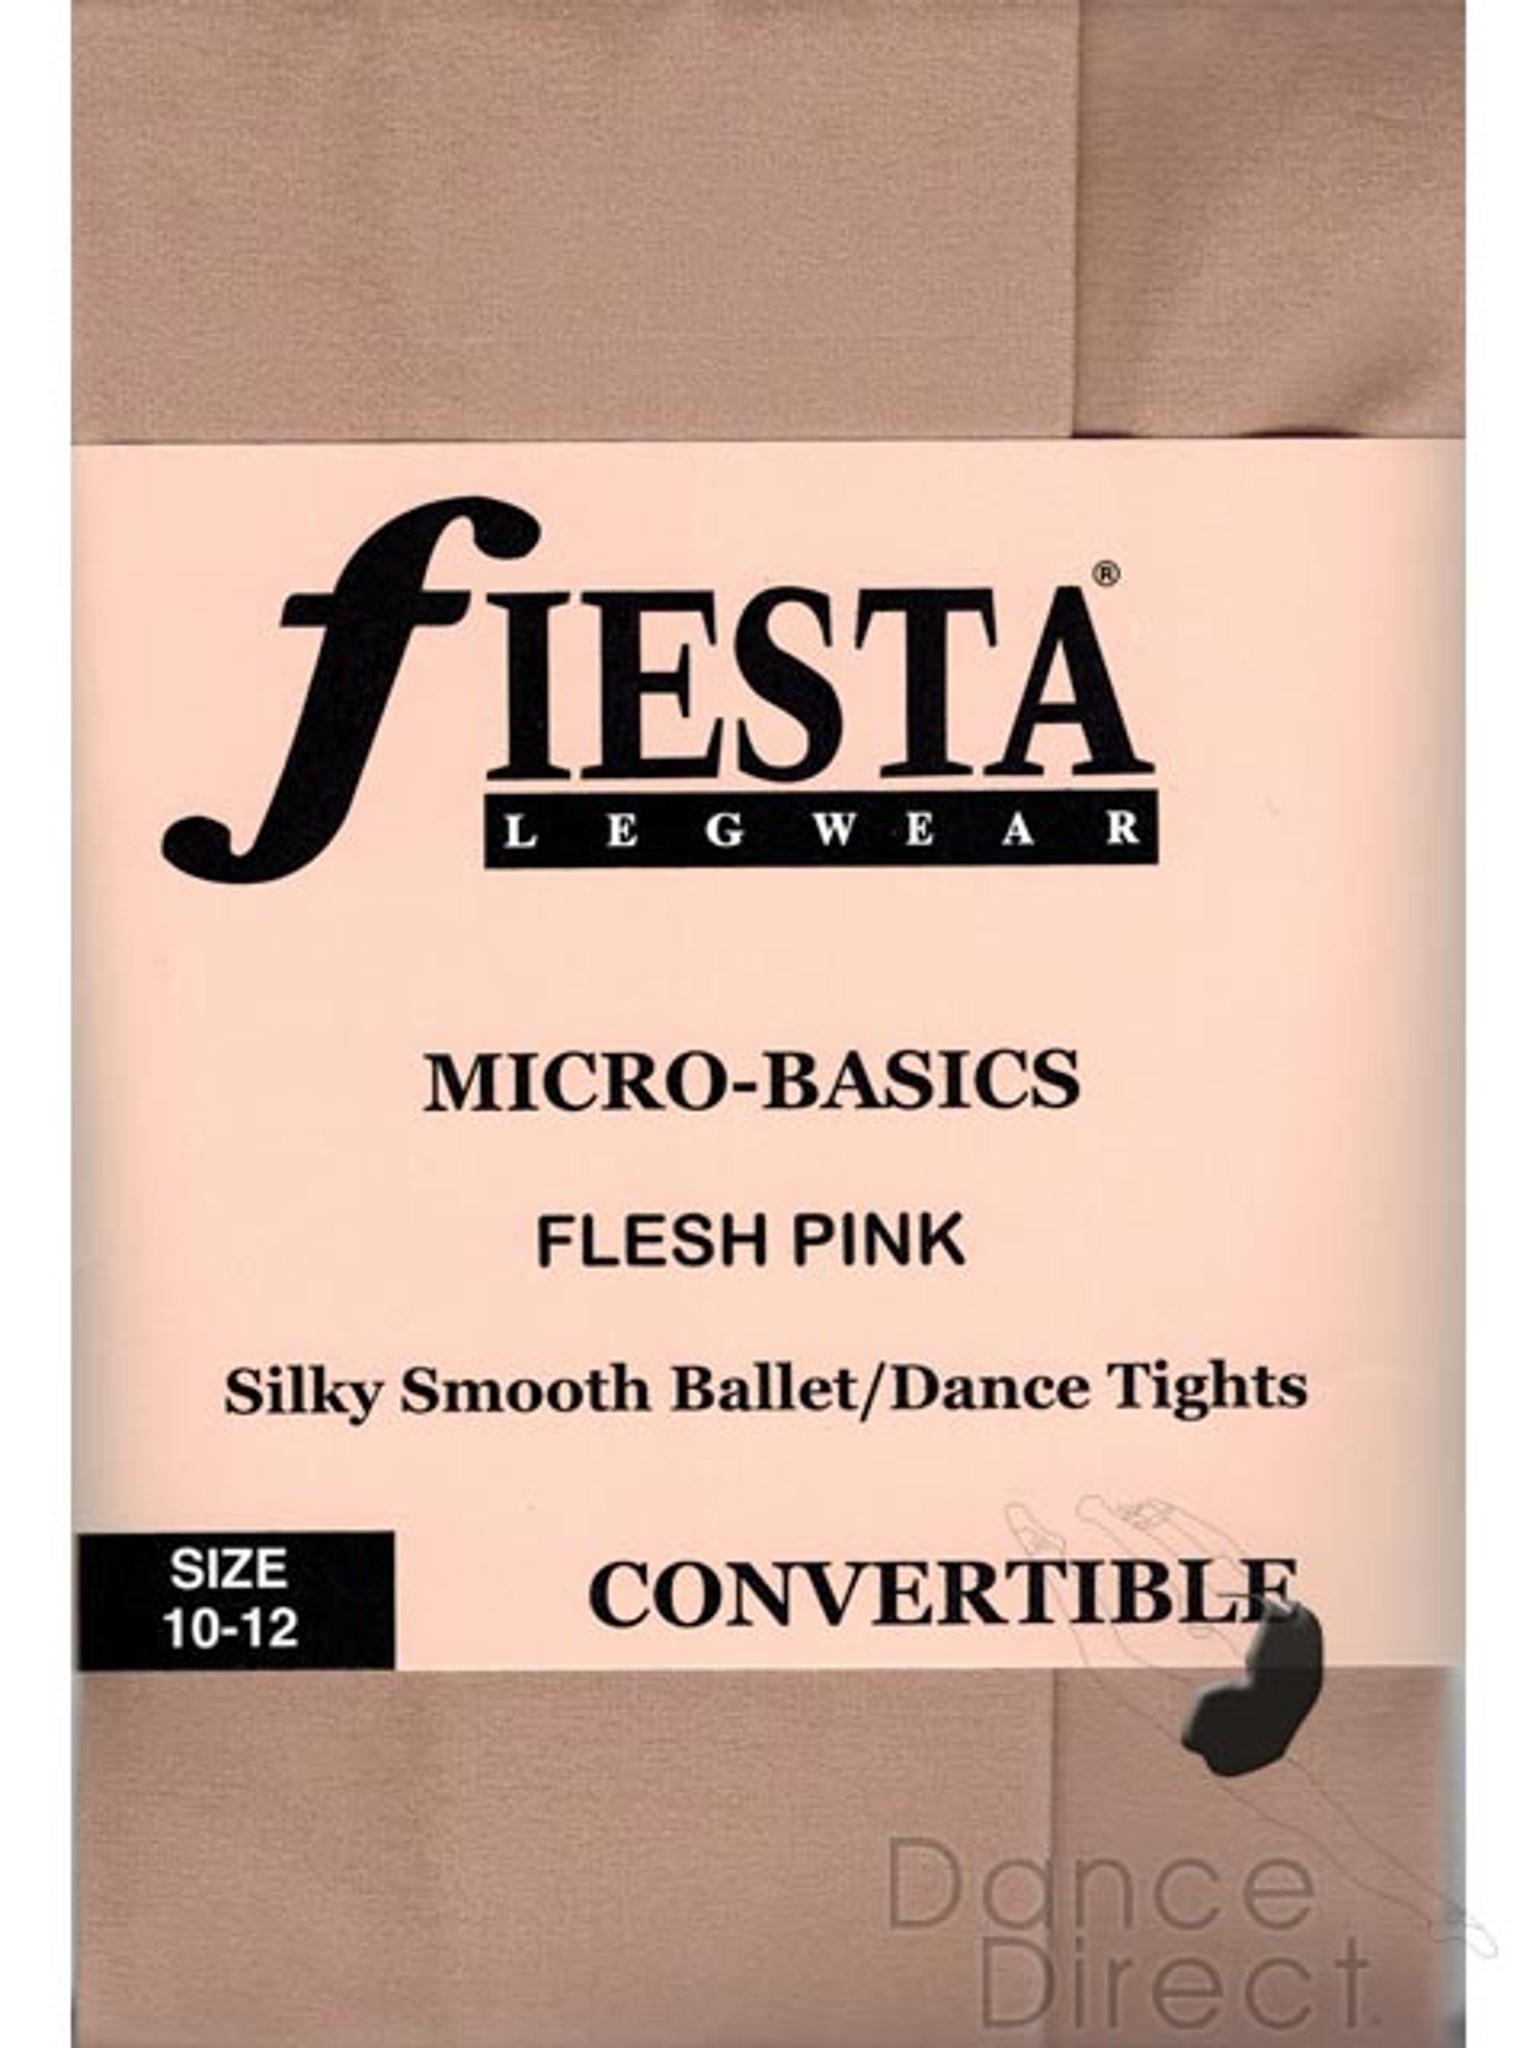 Fiesta Matte Micro Basic Convertible Dance Tights - Girls